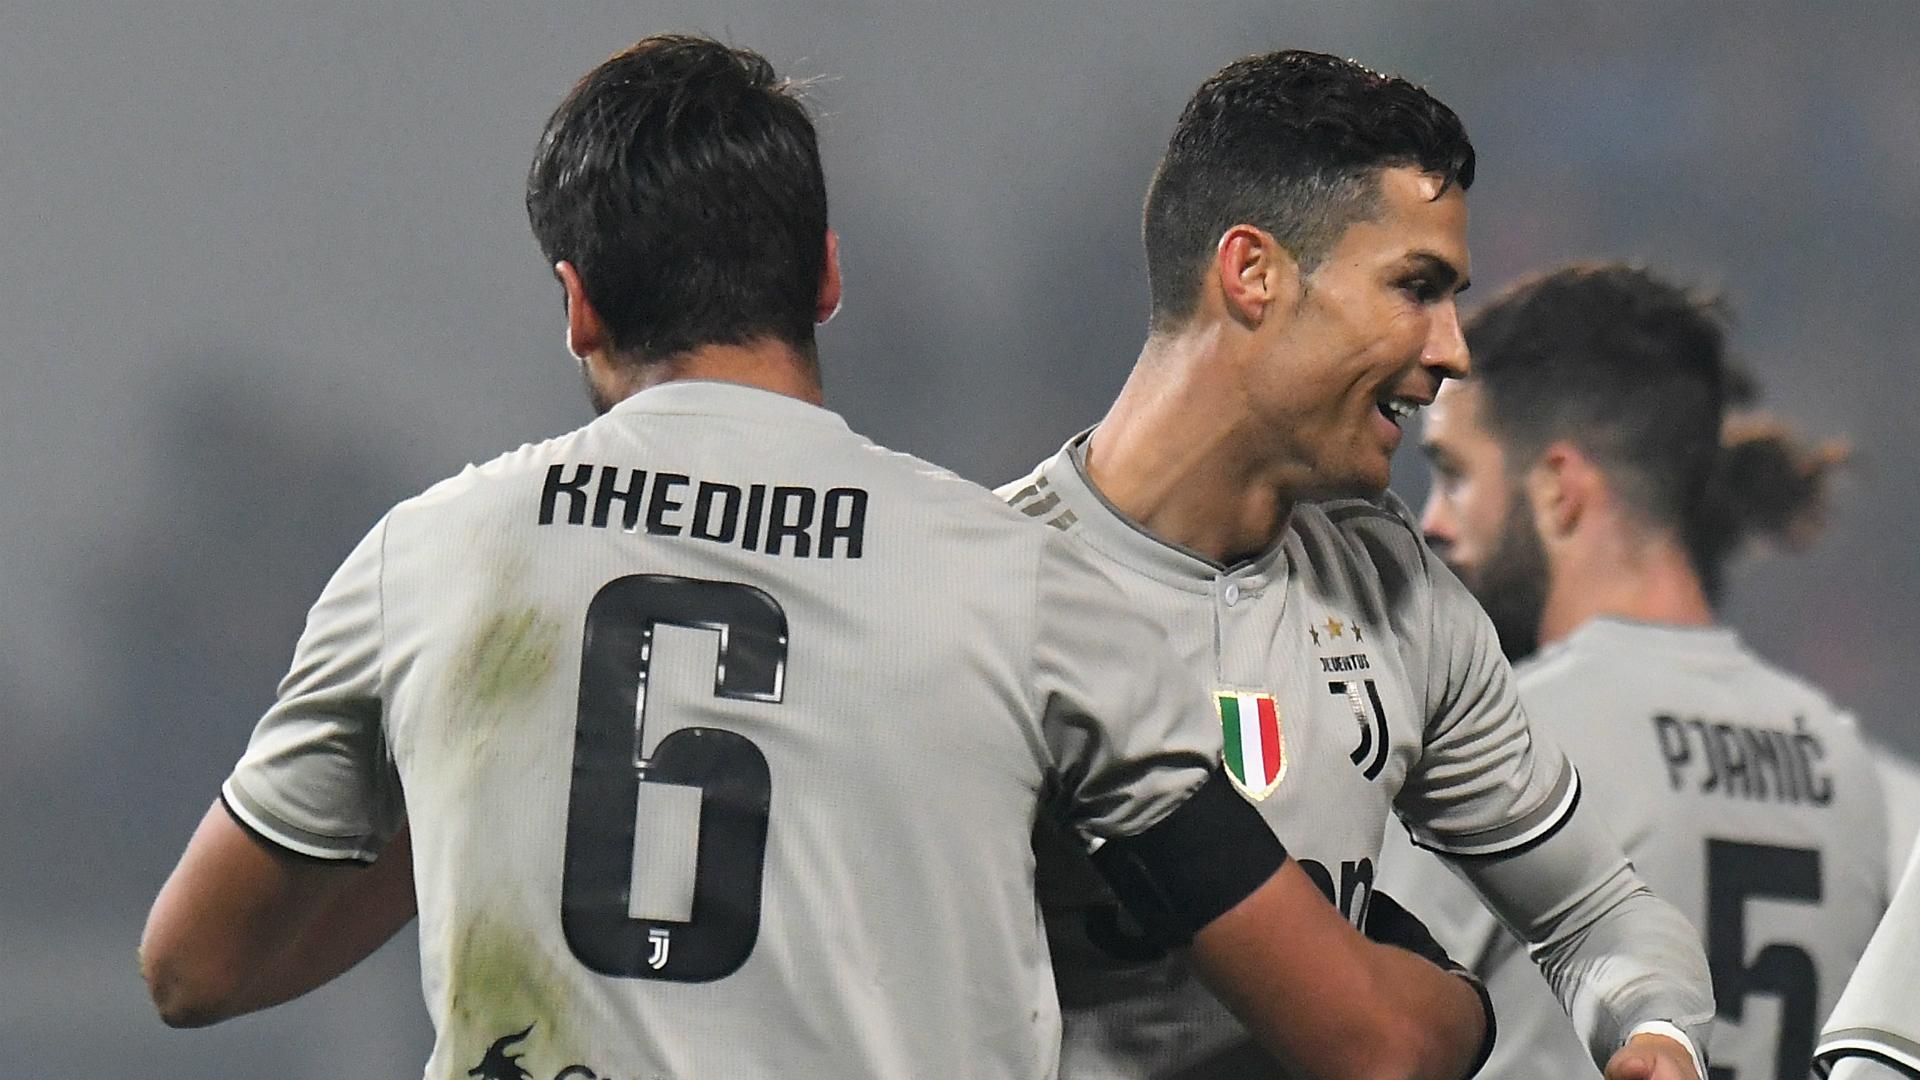 Khedira hails extraordinary Ronaldo